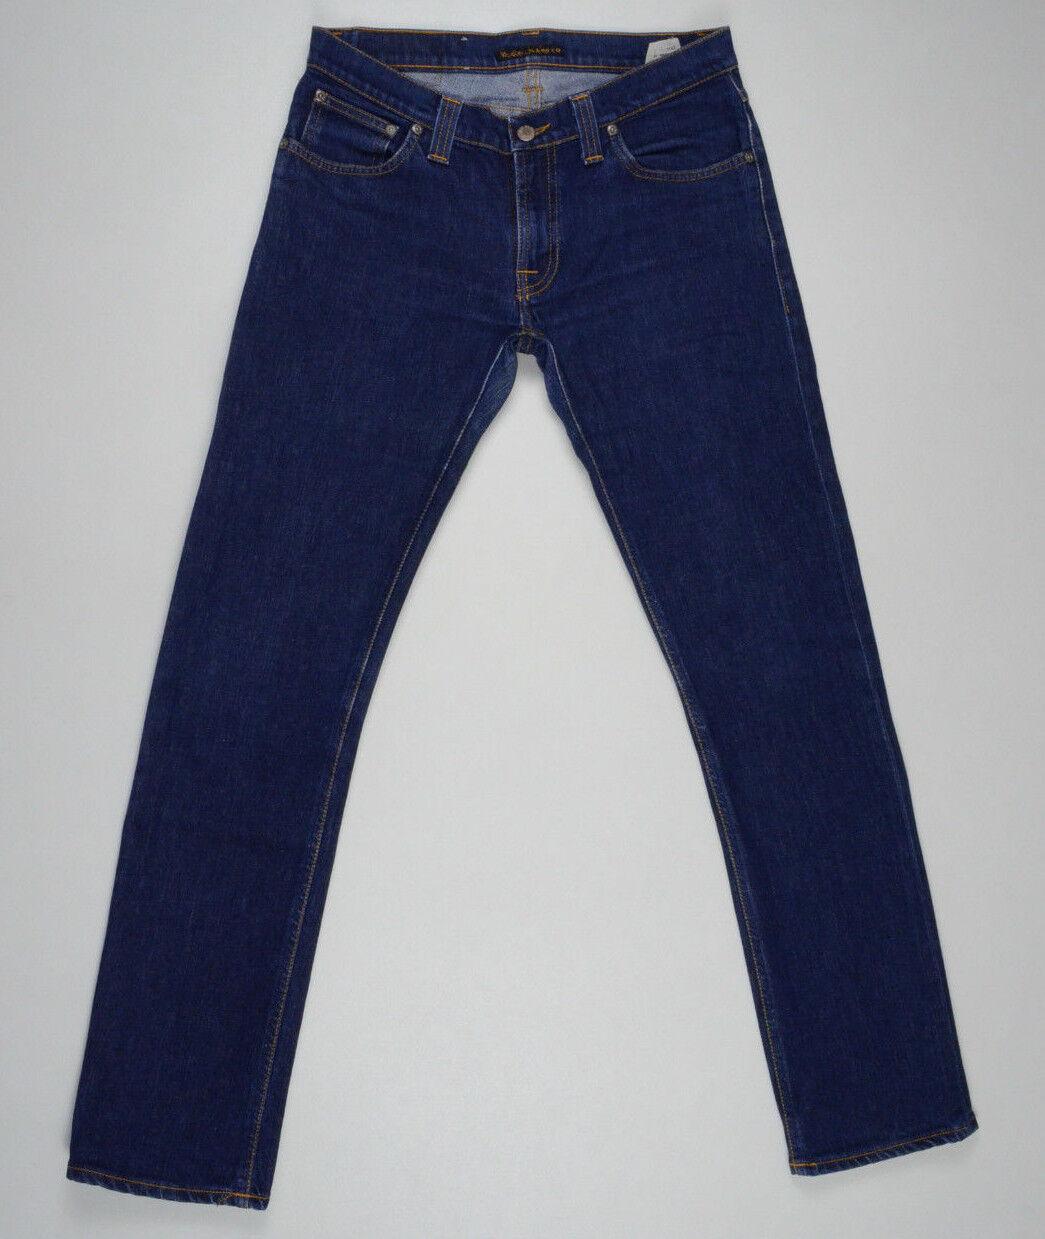 Nudie Jeans  SUPER SLIM KIM DRY STRETH  Jeans W32 L32 EUC RRP  249 kvinnor